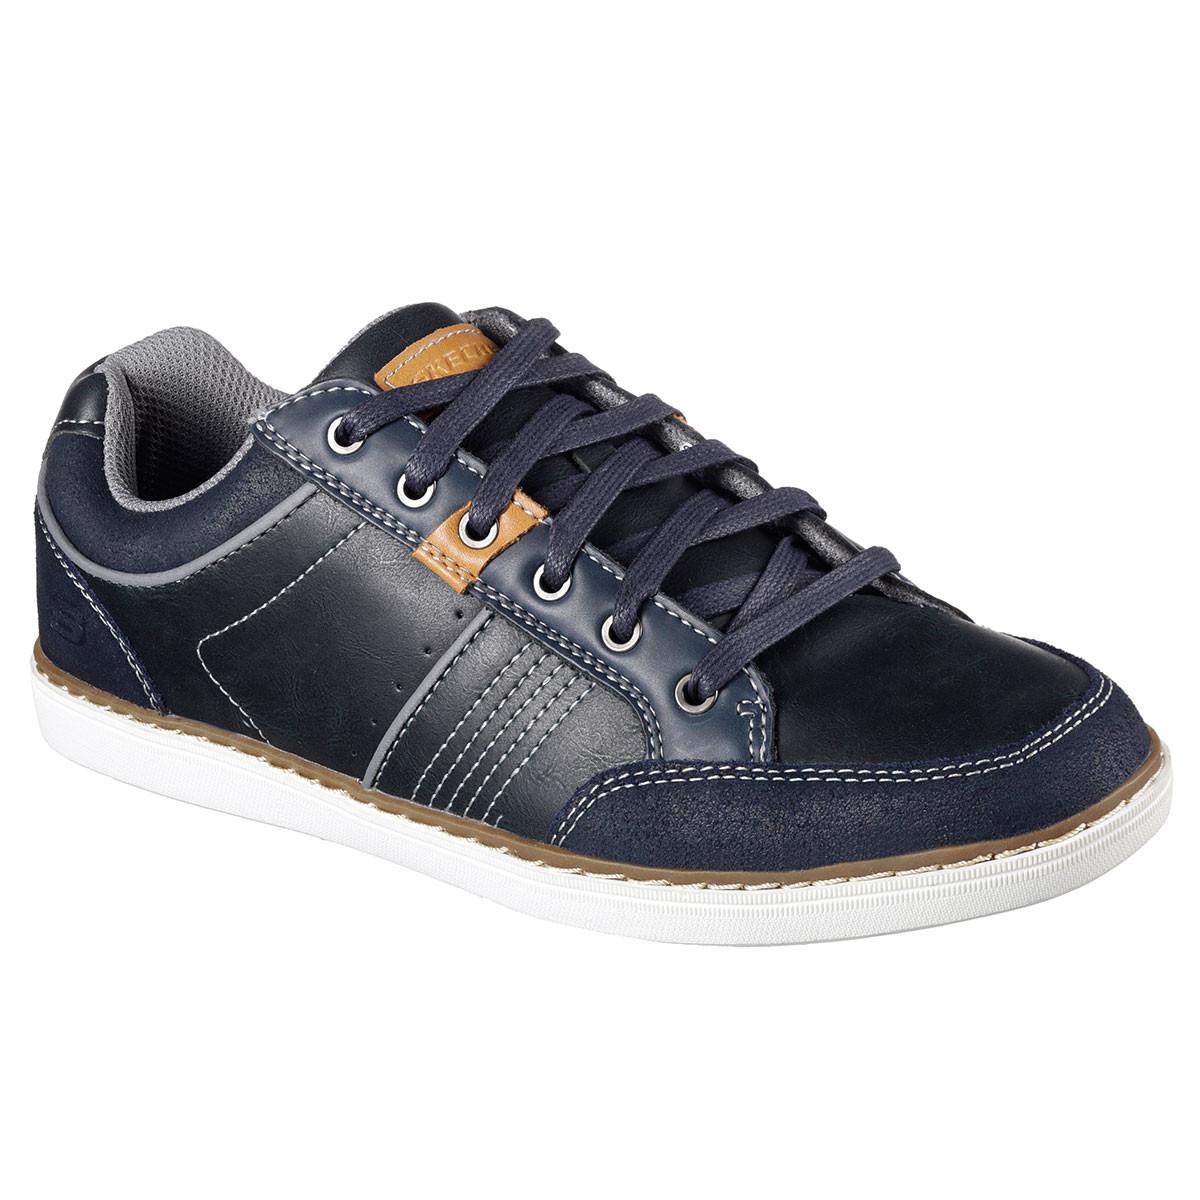 d49471bd484f Skechers Sport Mens Lanson Rometo Casual Shoes Trainers